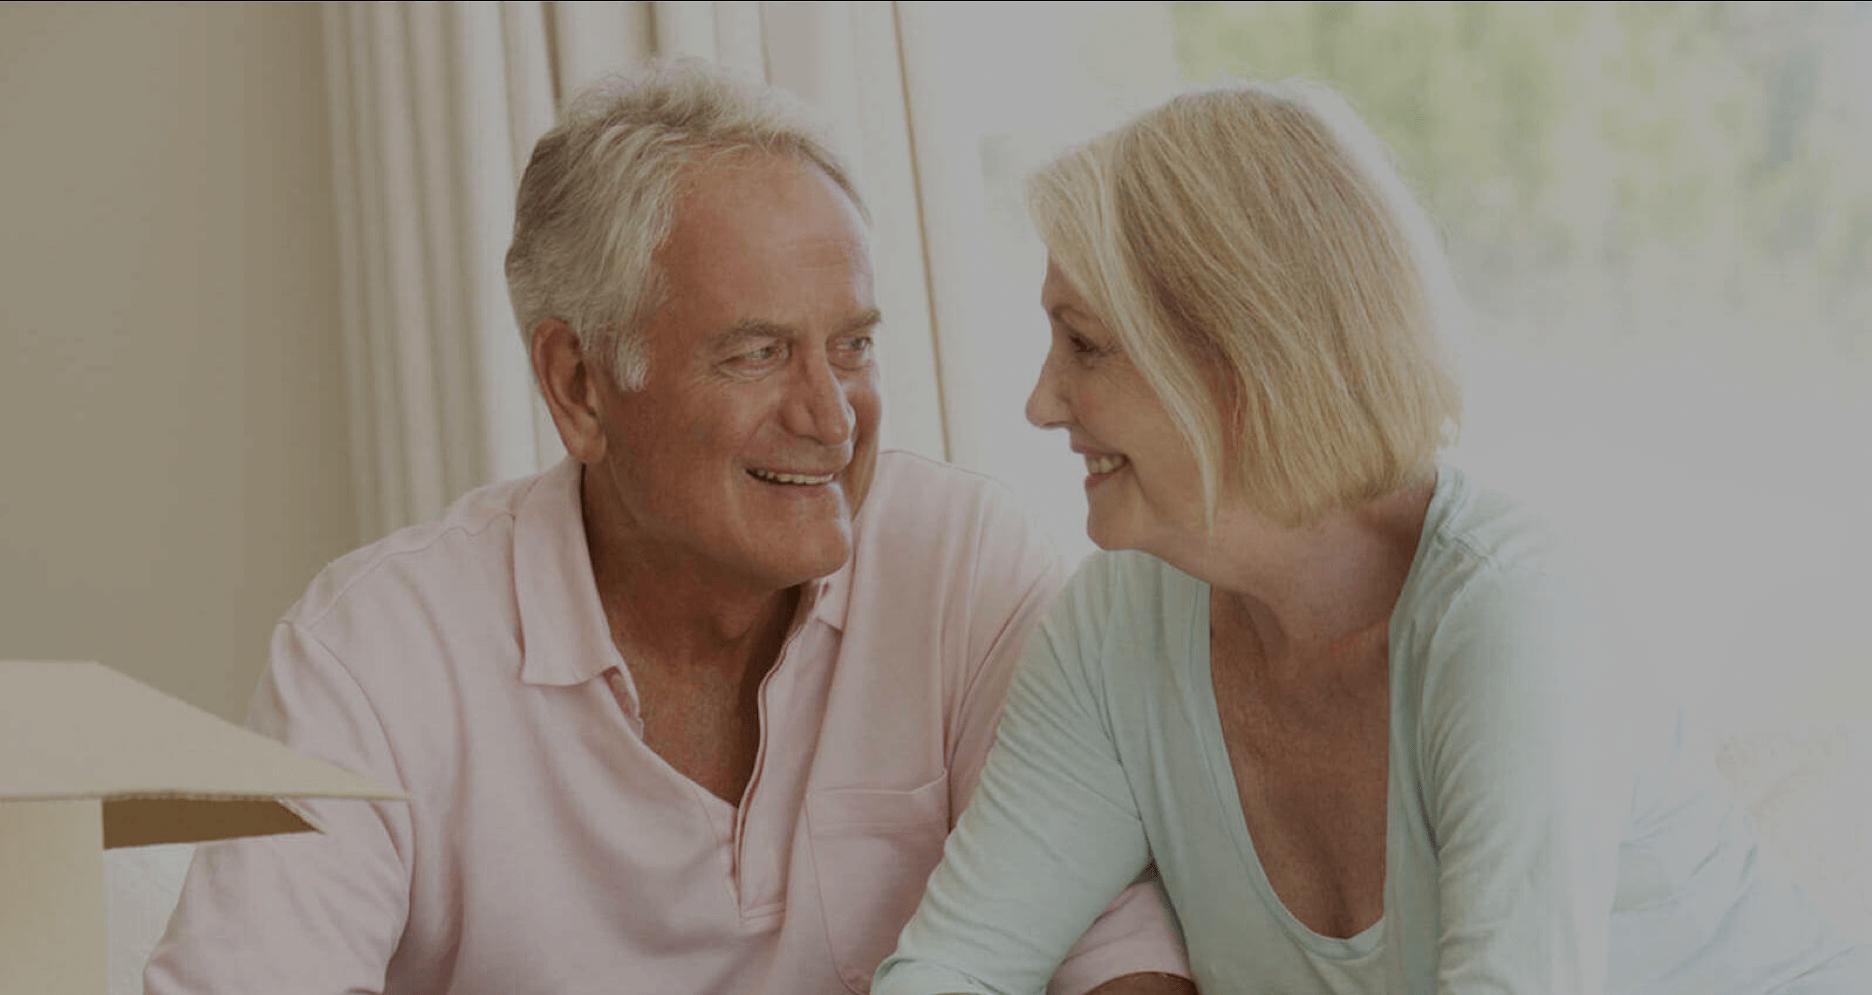 A senior couple downsize to a senior living community